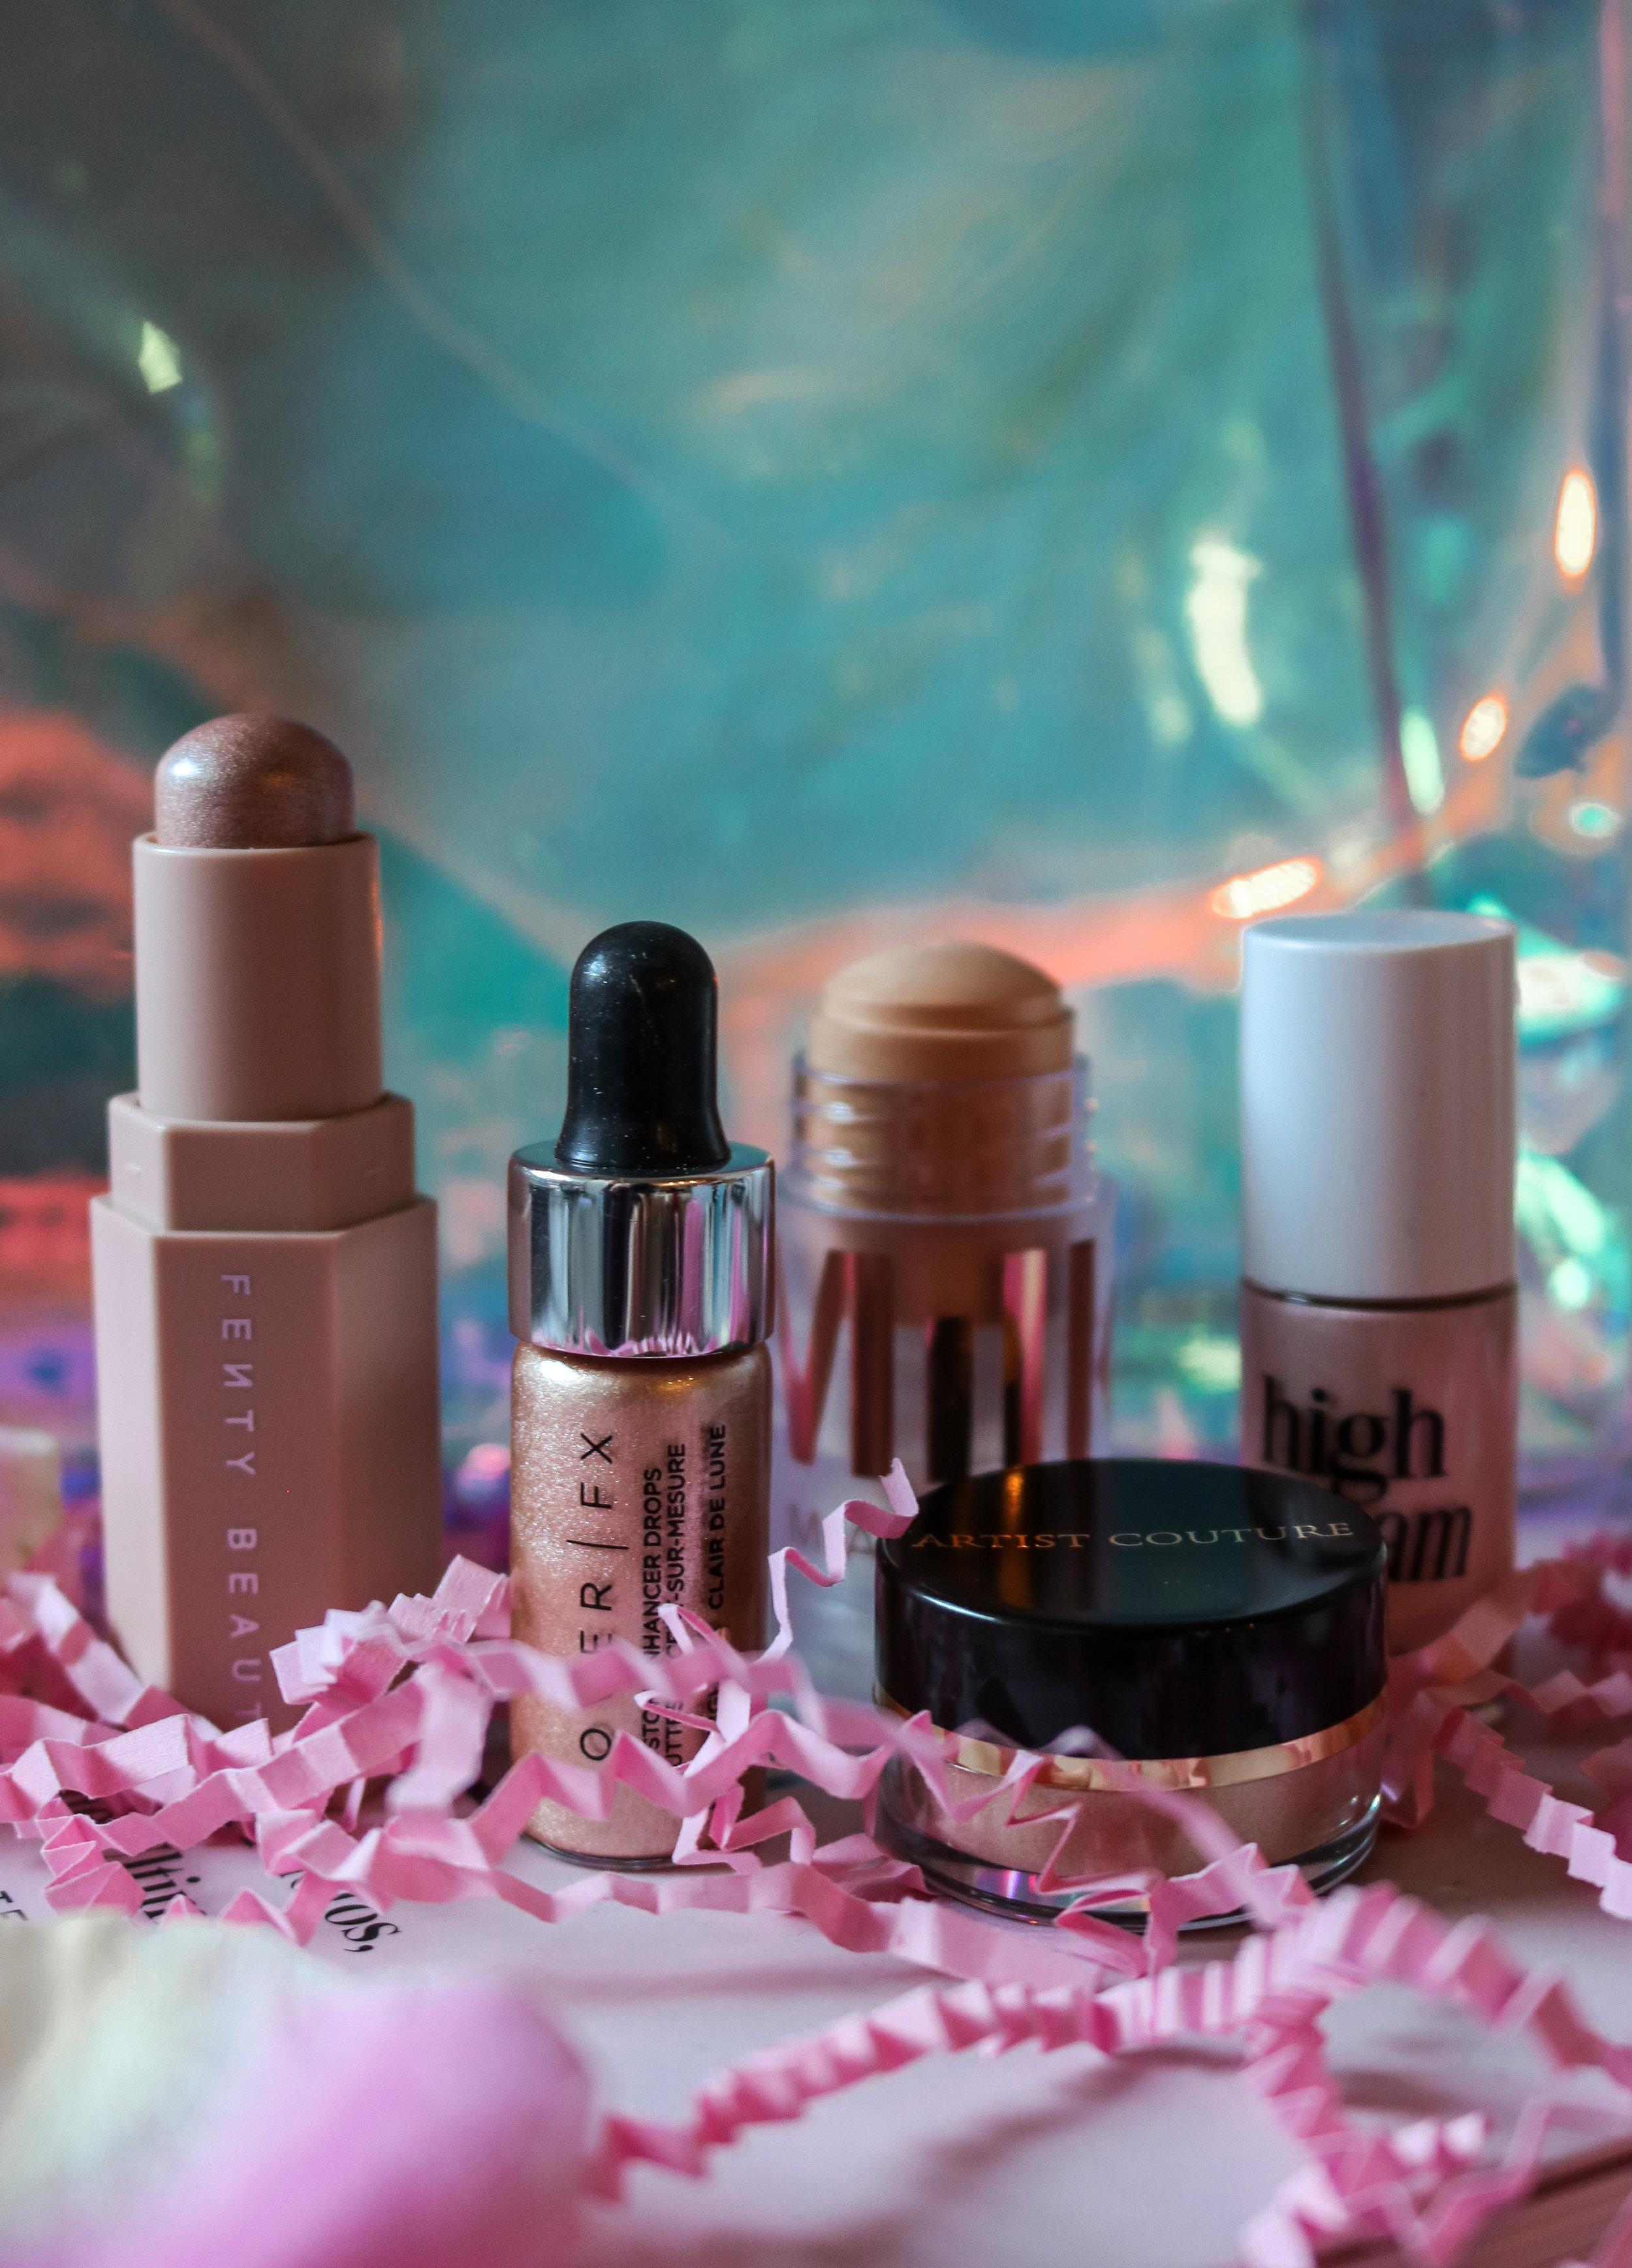 The Hungarian Brunette glow for it sephora favourites hihglighter set review - Milk makeup luminous blur stick, Fenty Beauty Match Stix, Benefit high beam, cover fx enhancer drops, artist couture diamond glow powder (1 of 3).jpg